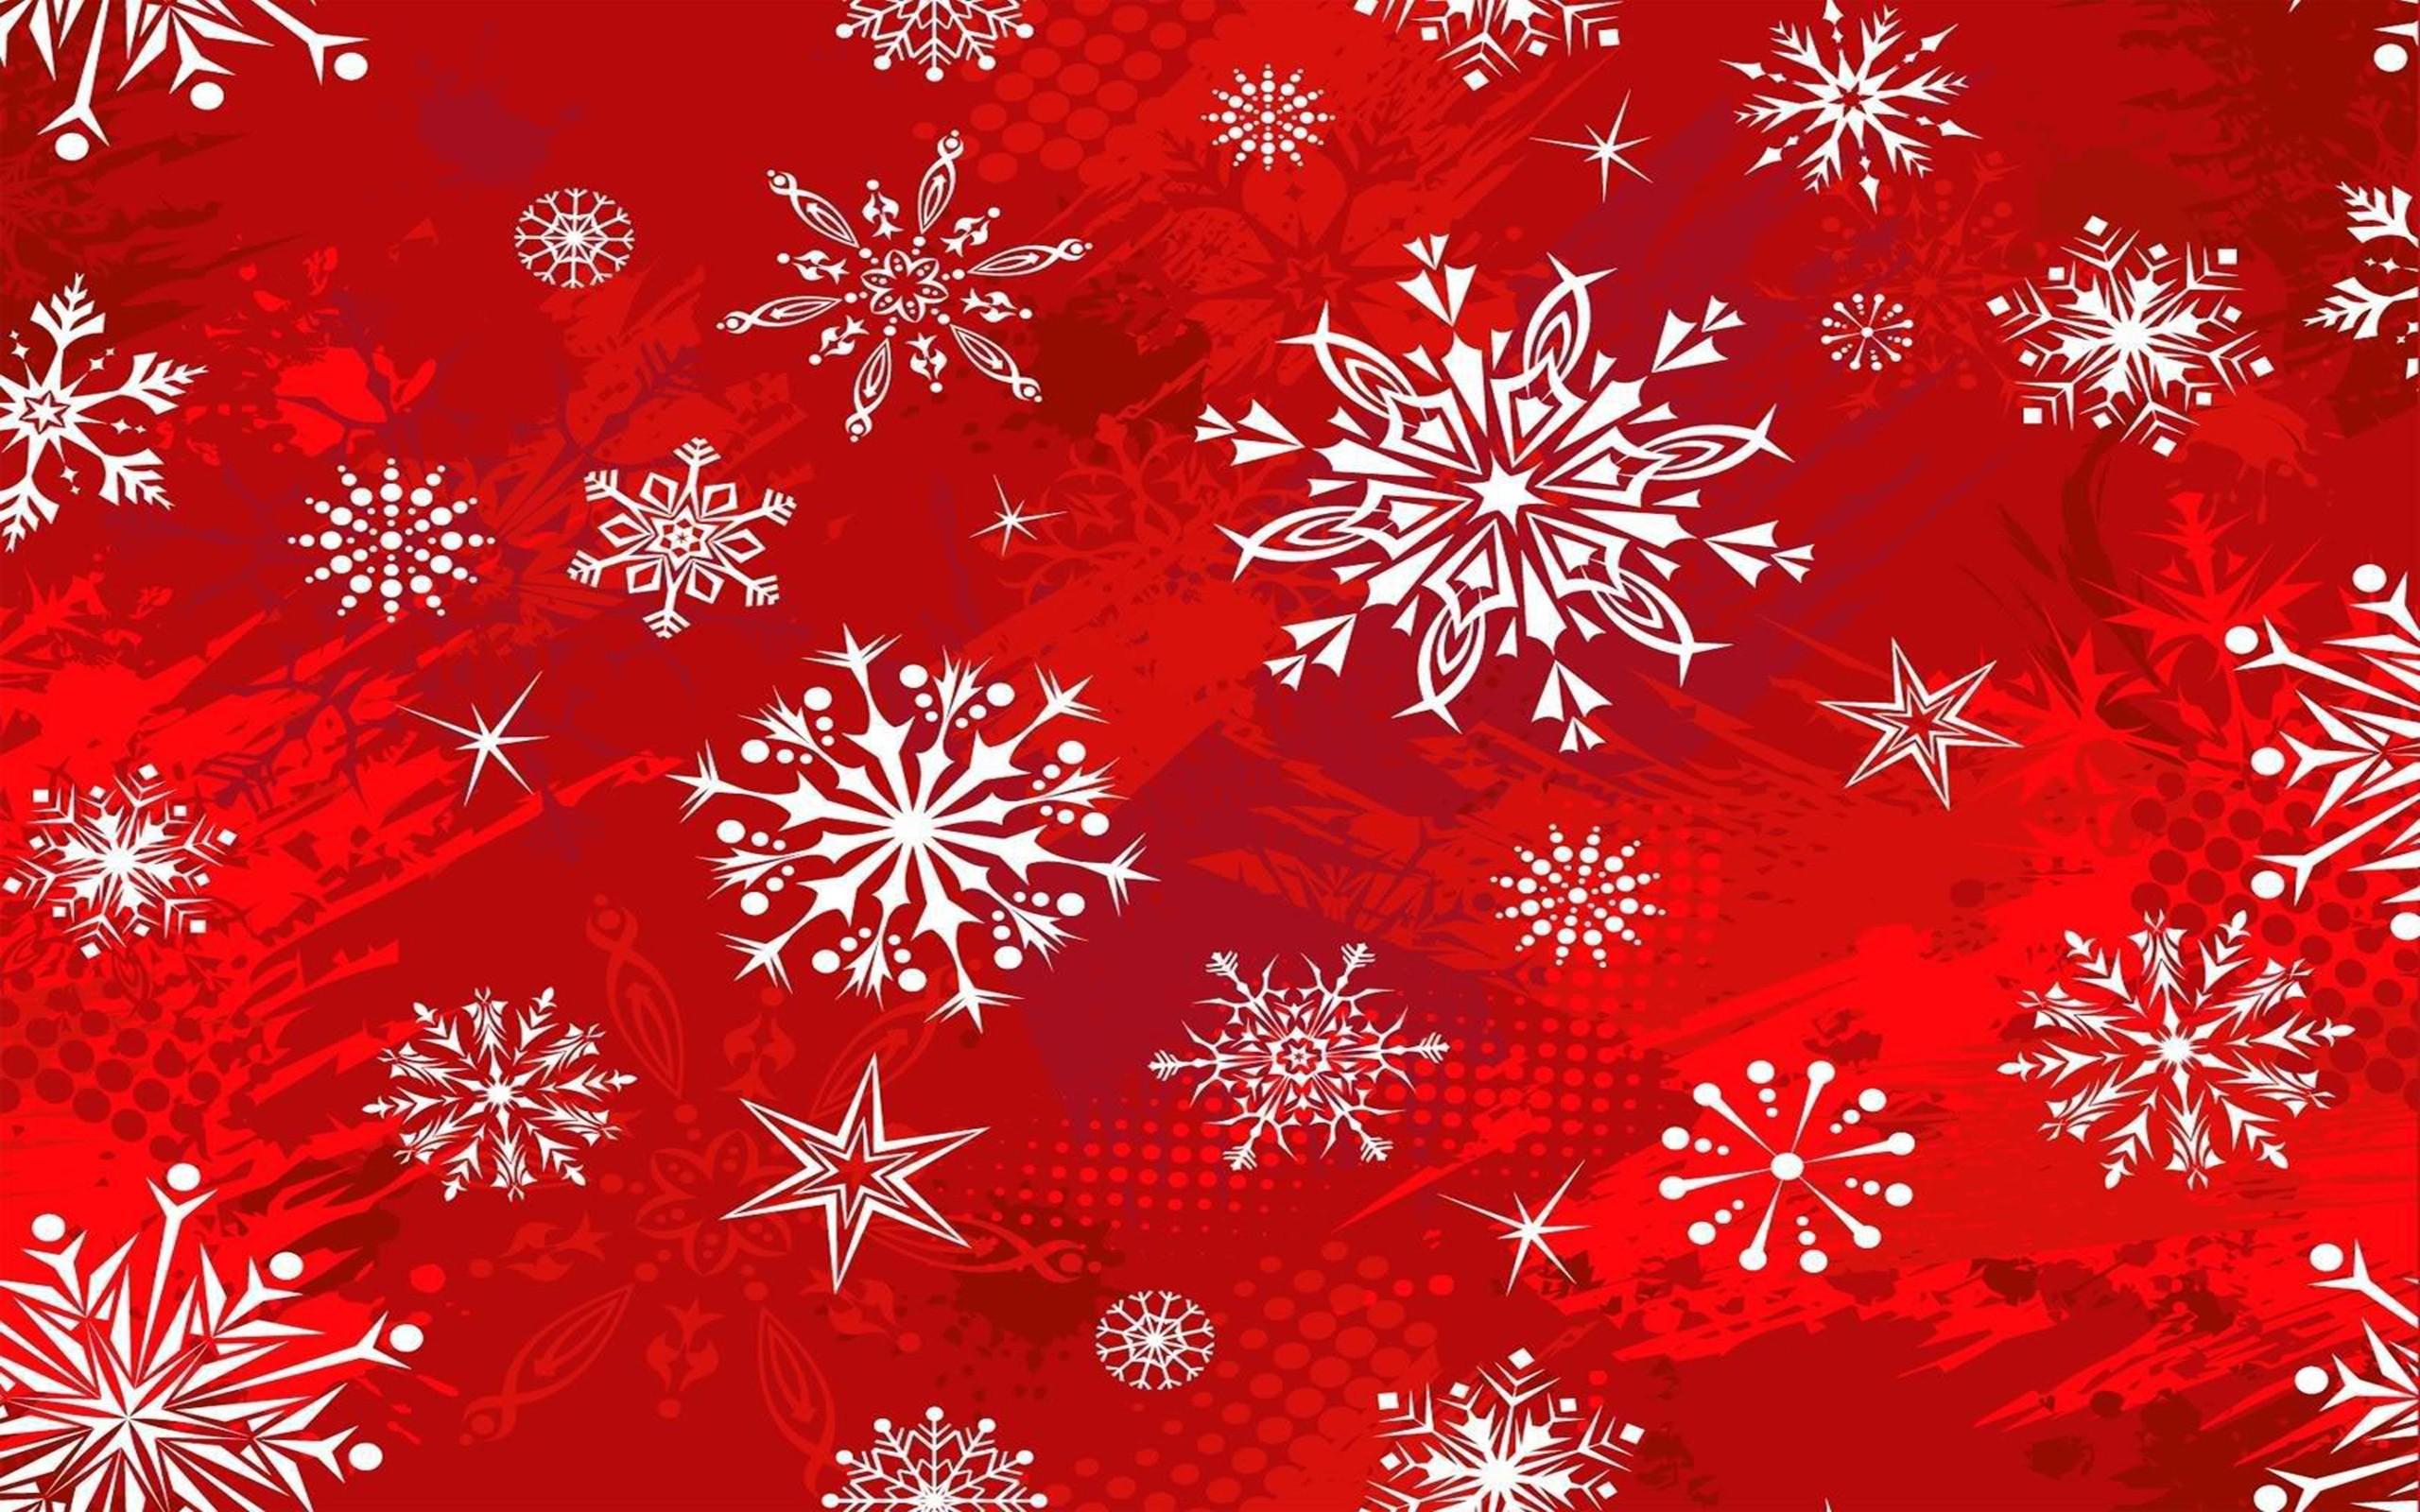 Animated Christmas Wallpaper For Ipad: Cute Christmas Wallpapers For Ipad Best HD Wallpaper